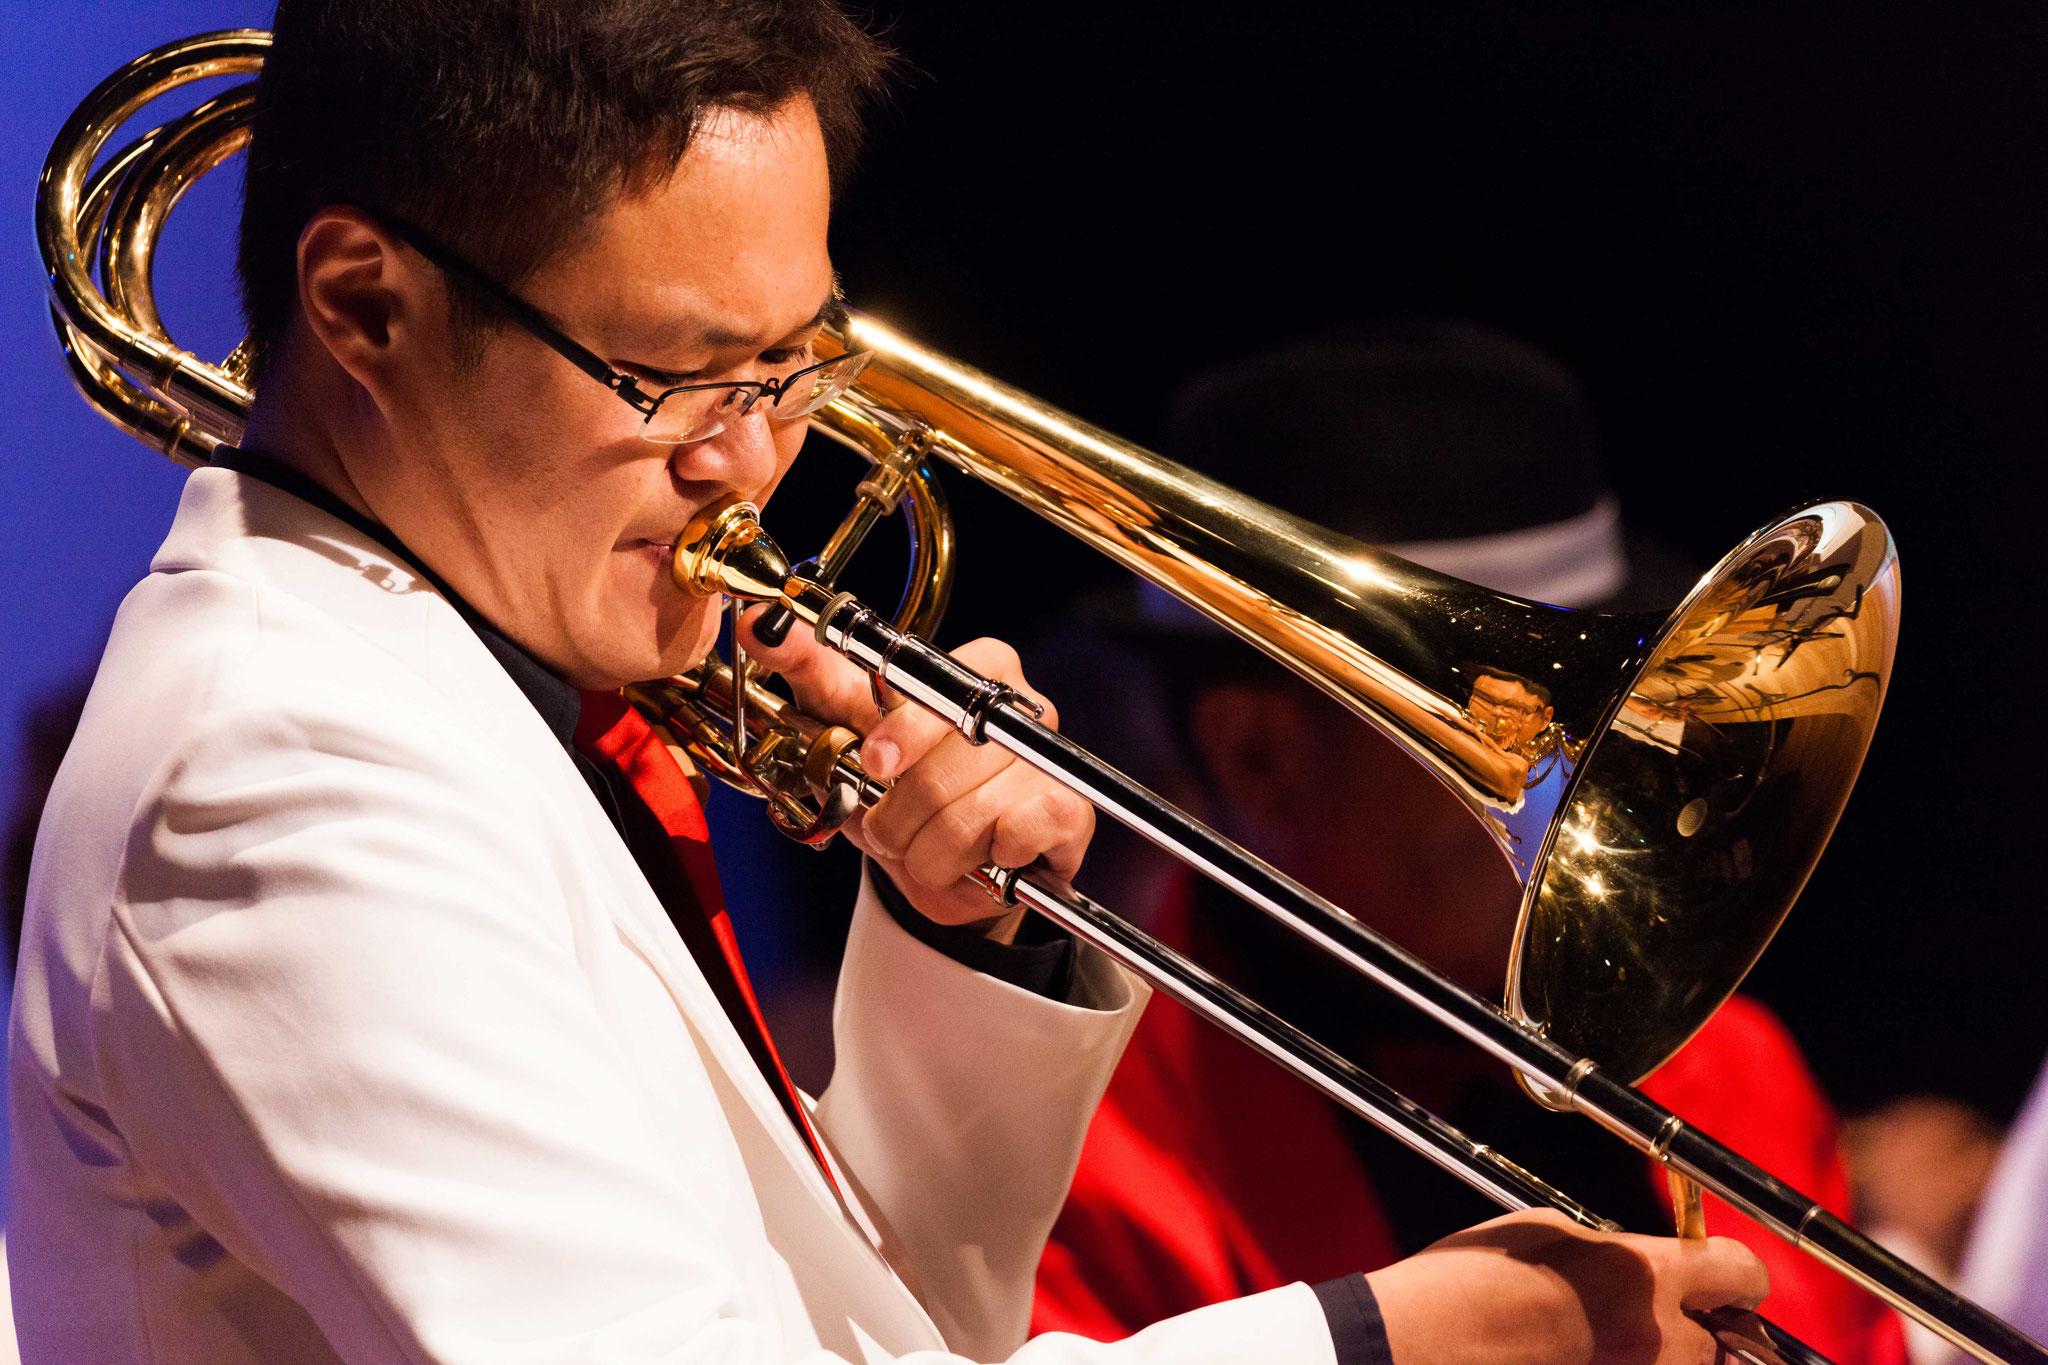 加納武(bass trombone)